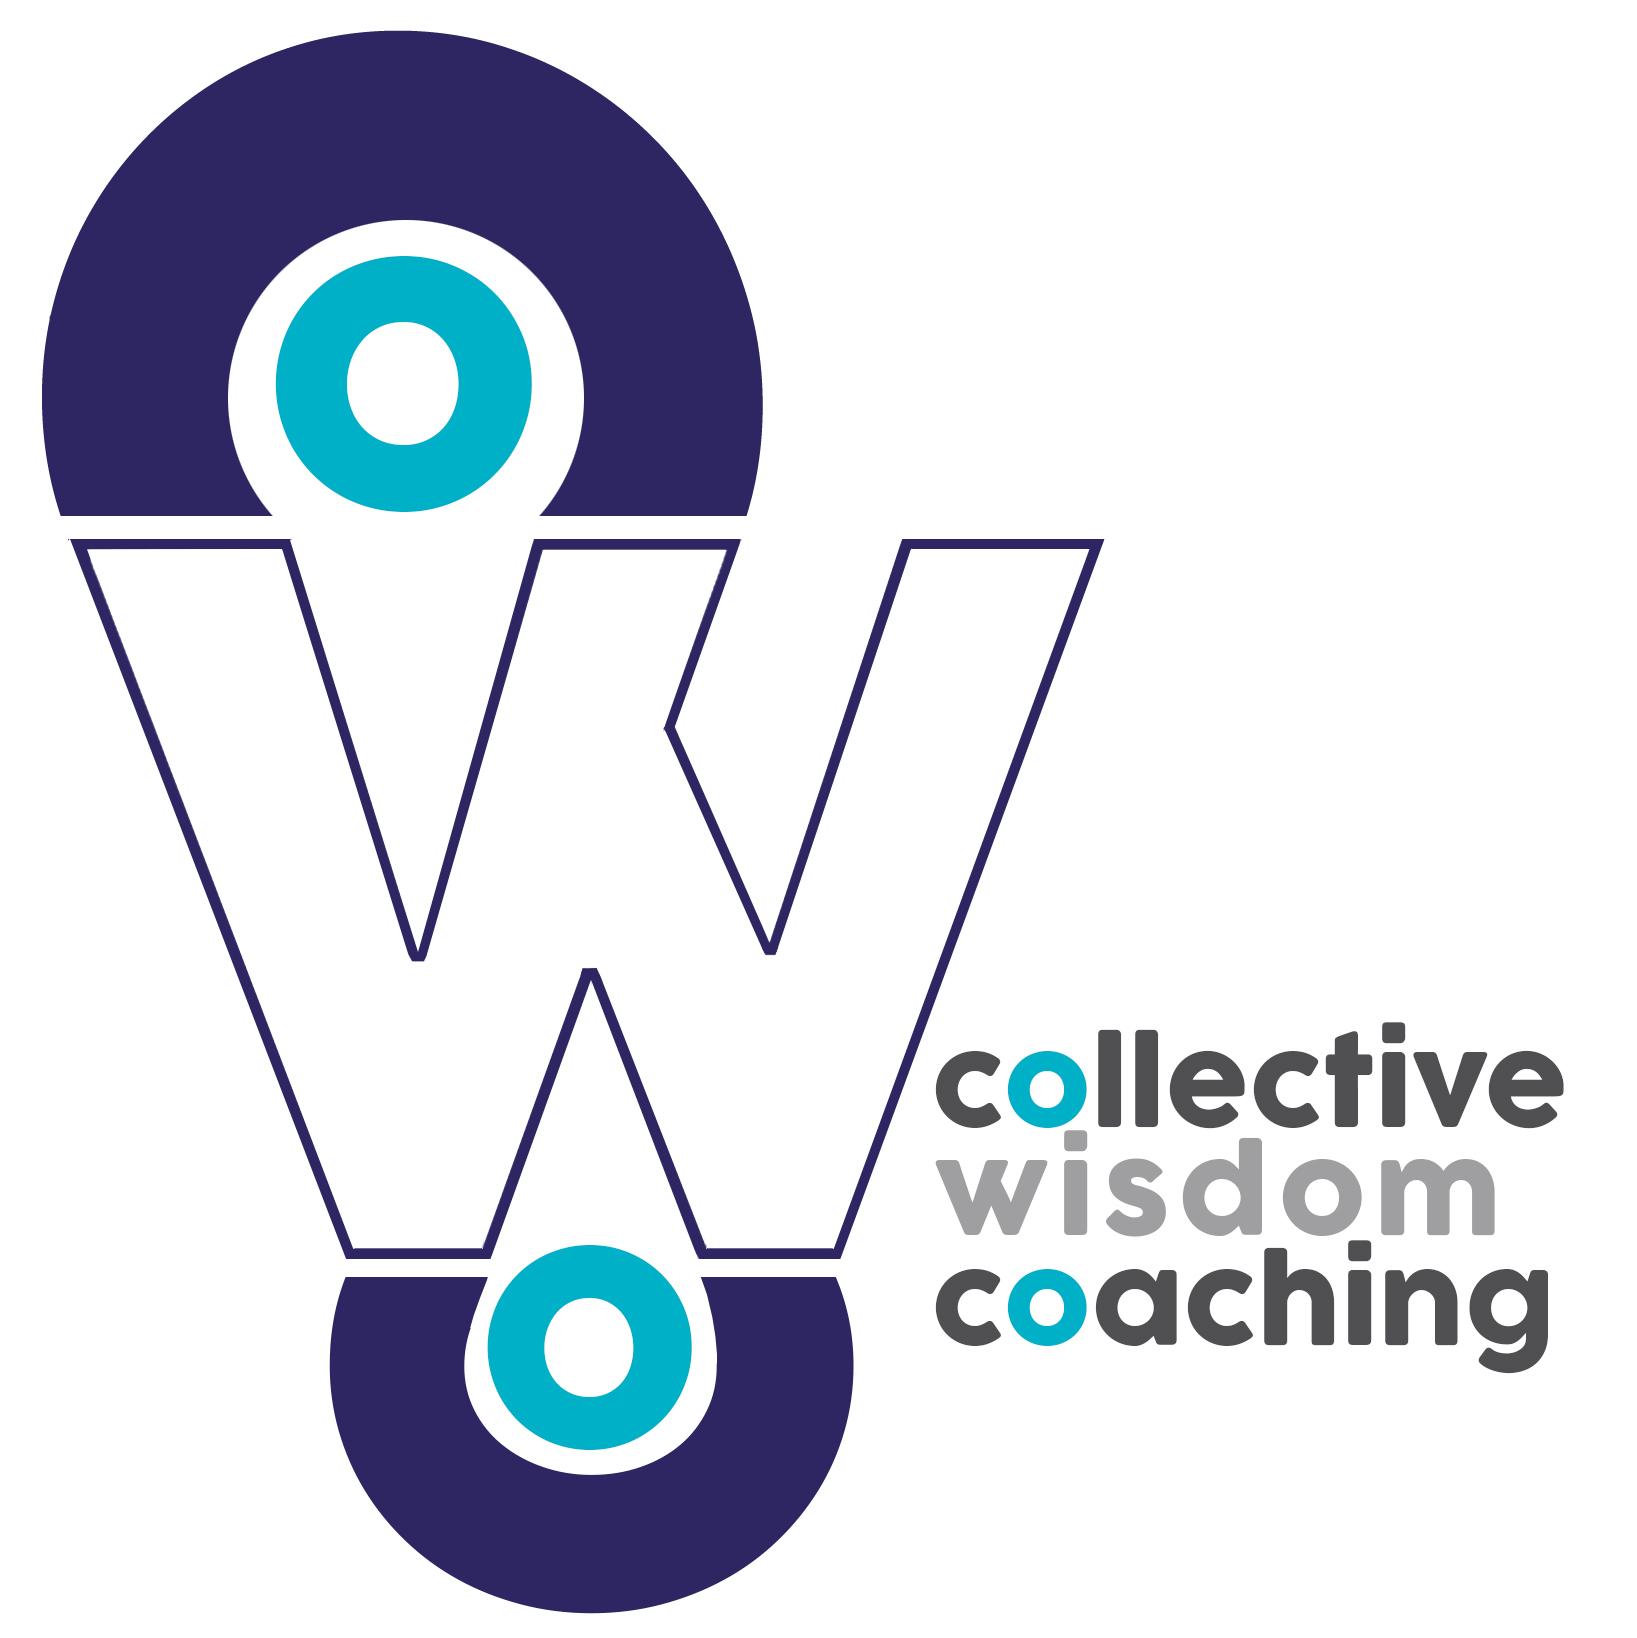 CWC logo dunkel hell dunkel